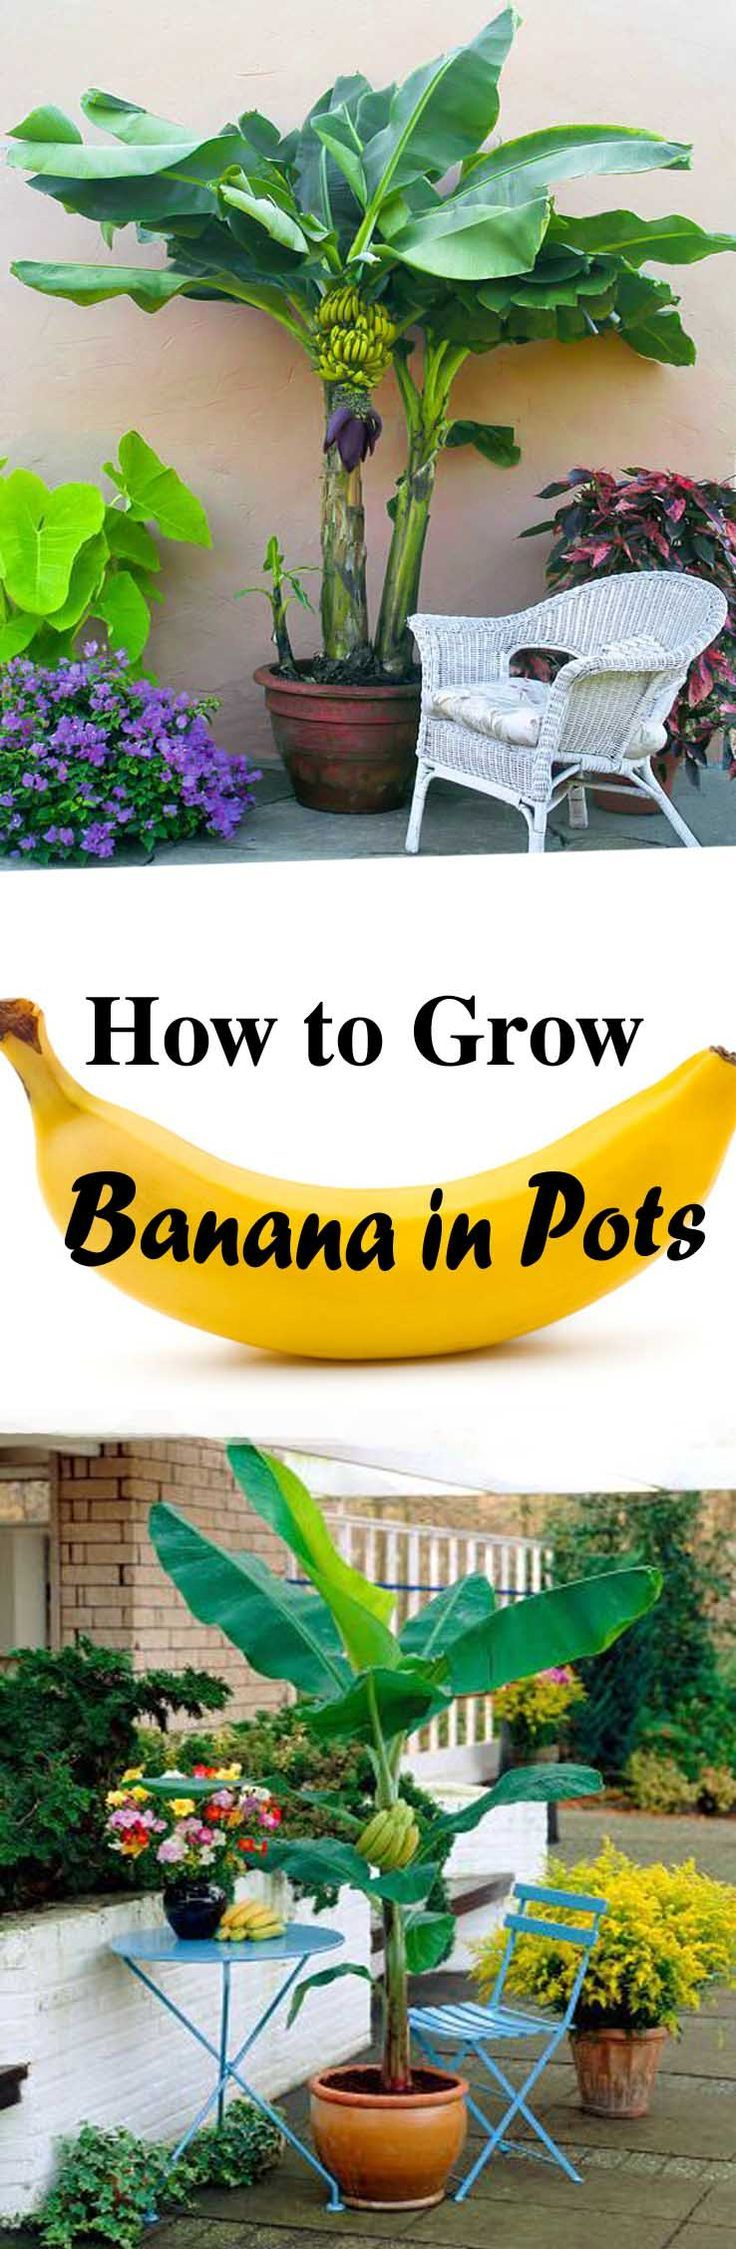 Growing banana trees in pots pinterest banana plants bananas